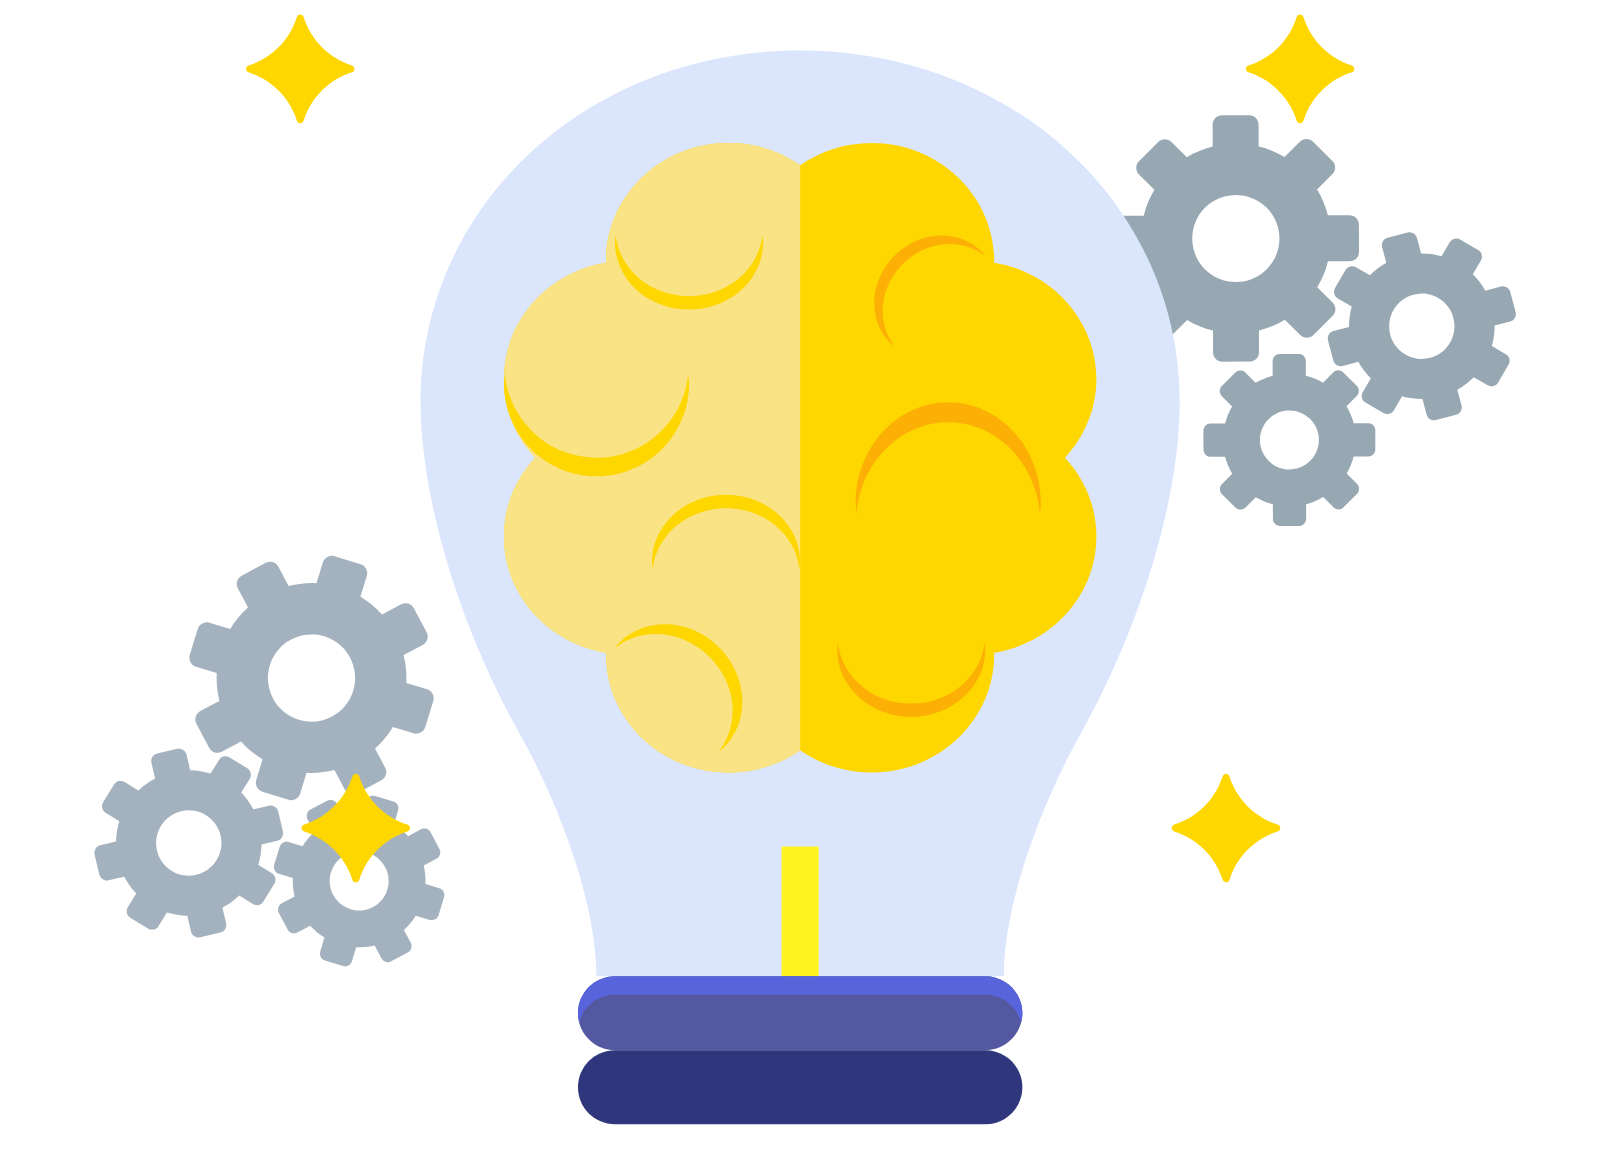 lightbulb with gears